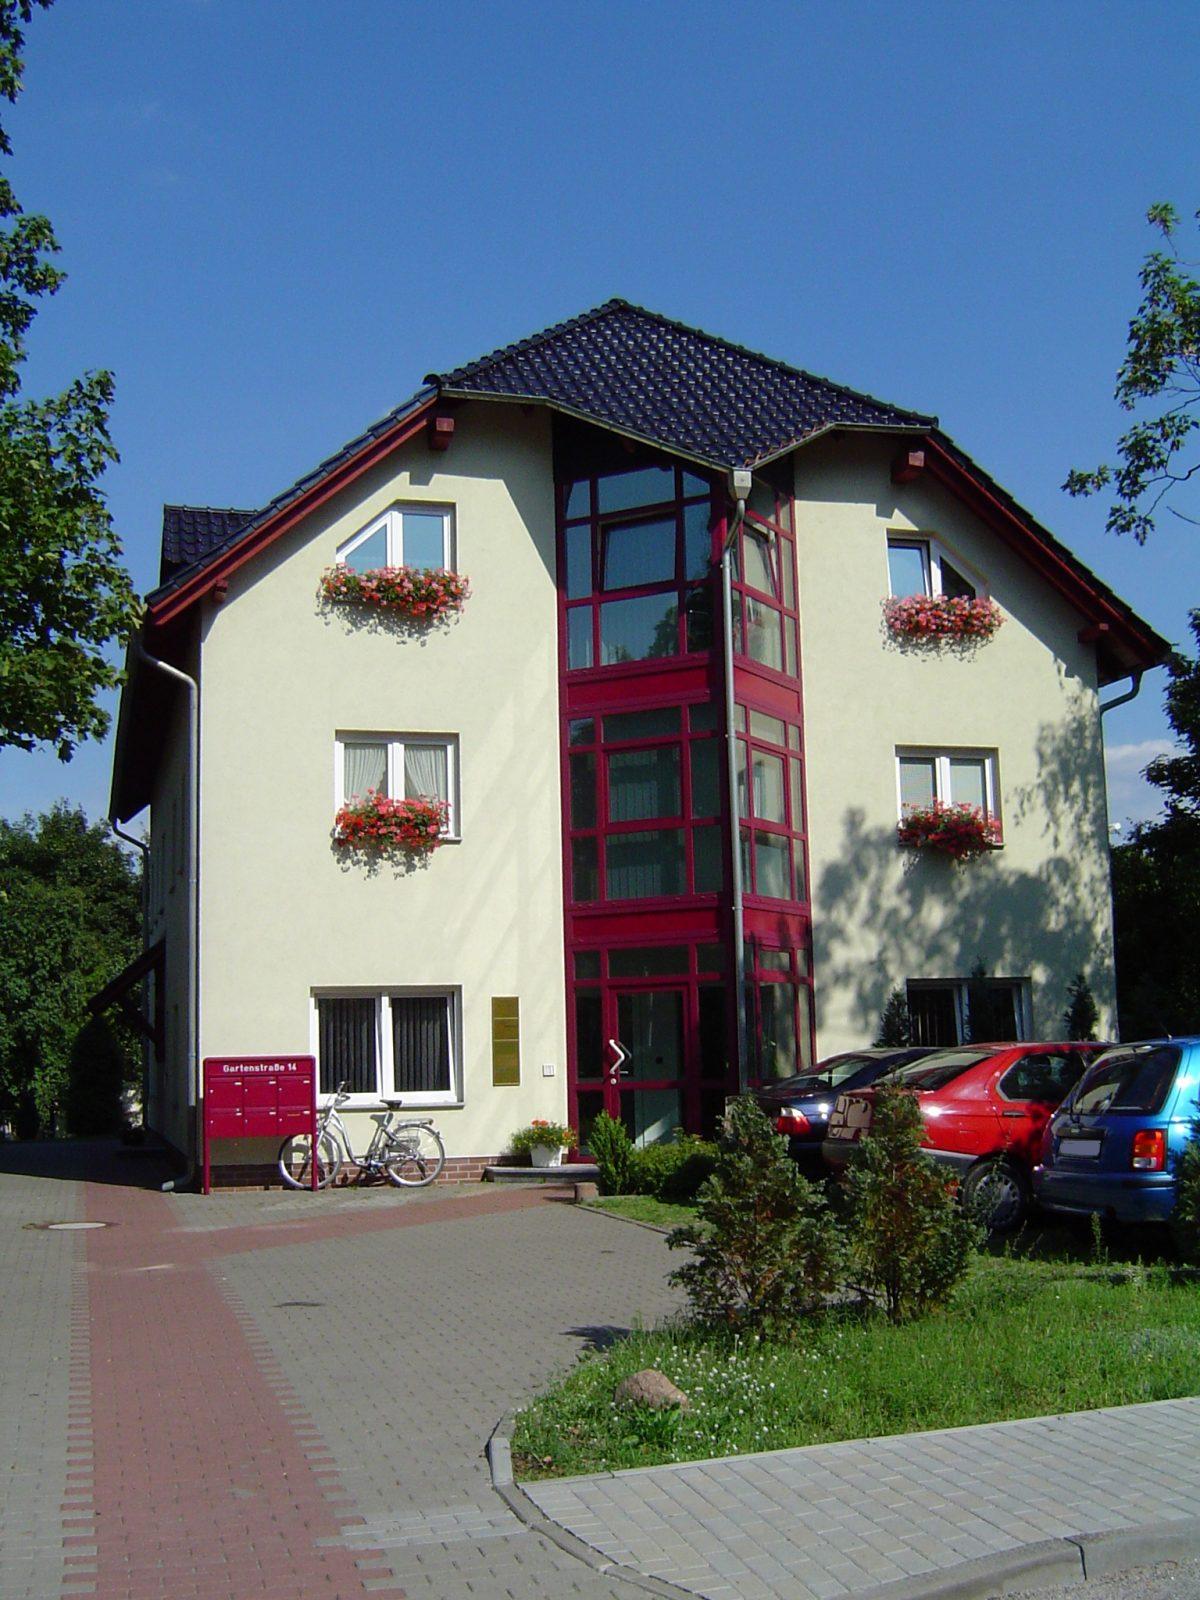 Firmensitz in Cottbus